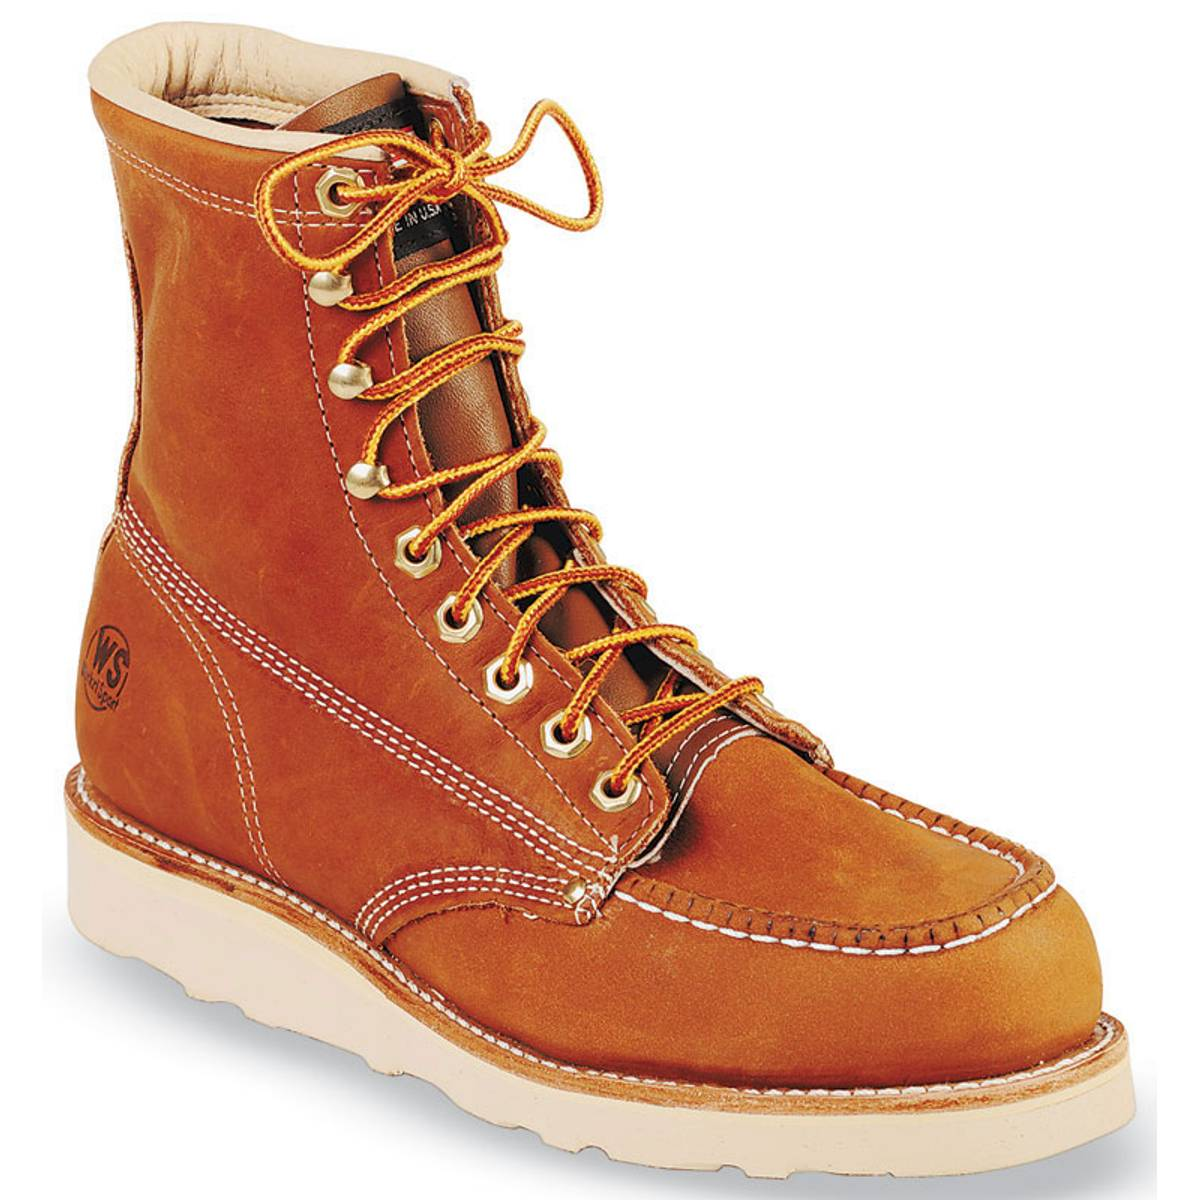 Bathroom scales boots - Work N Sport Men S 8 Wedge Sole